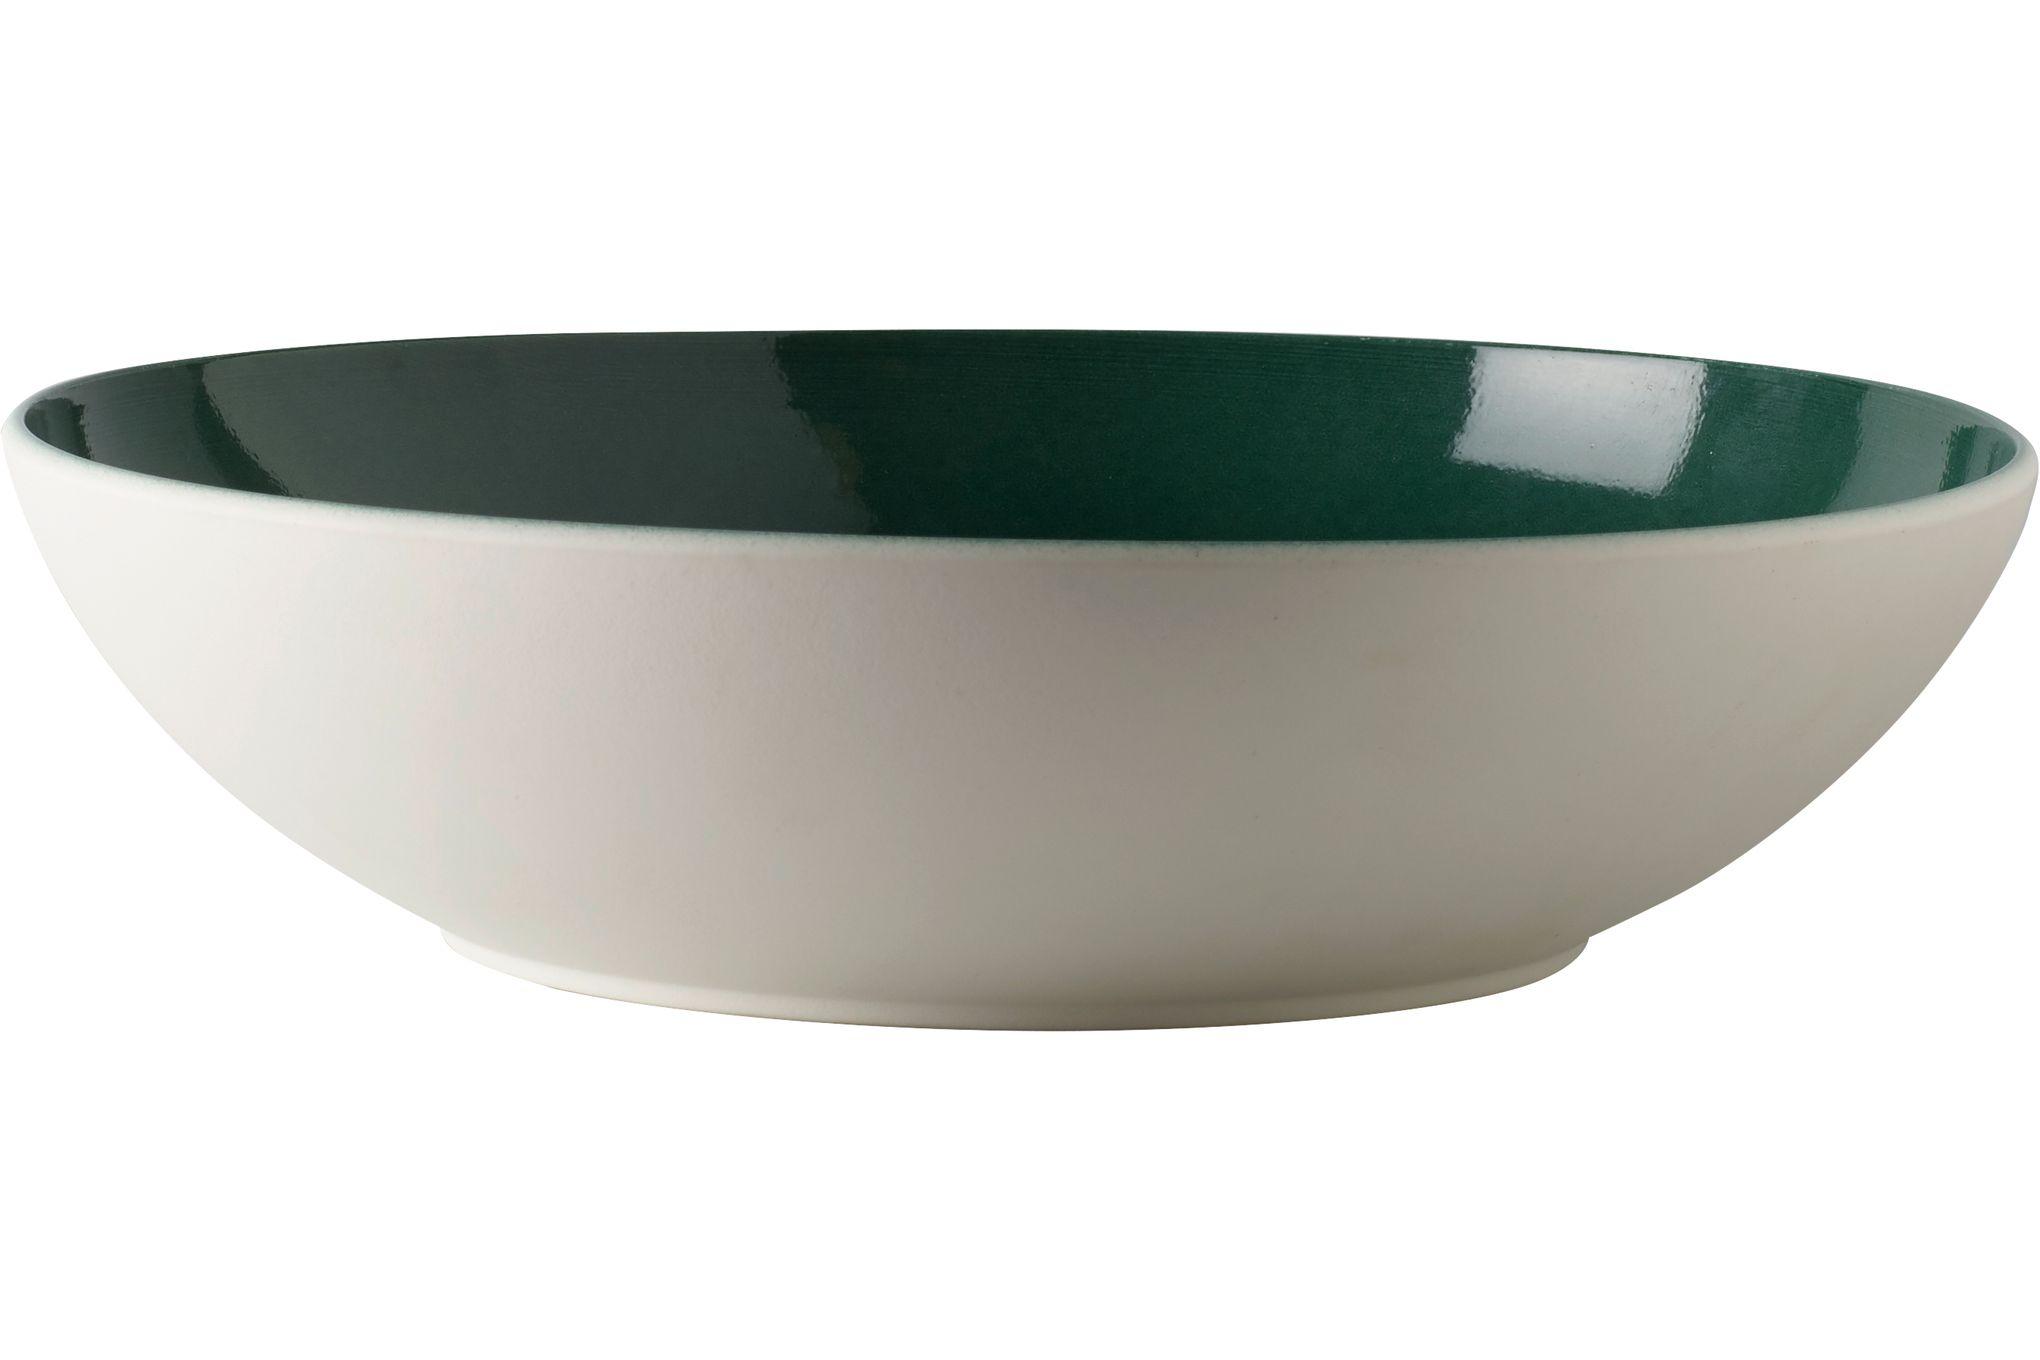 Villeroy & Boch It's my match Serving Bowl Uni - Green 26 x 6.5cm, 2l thumb 1